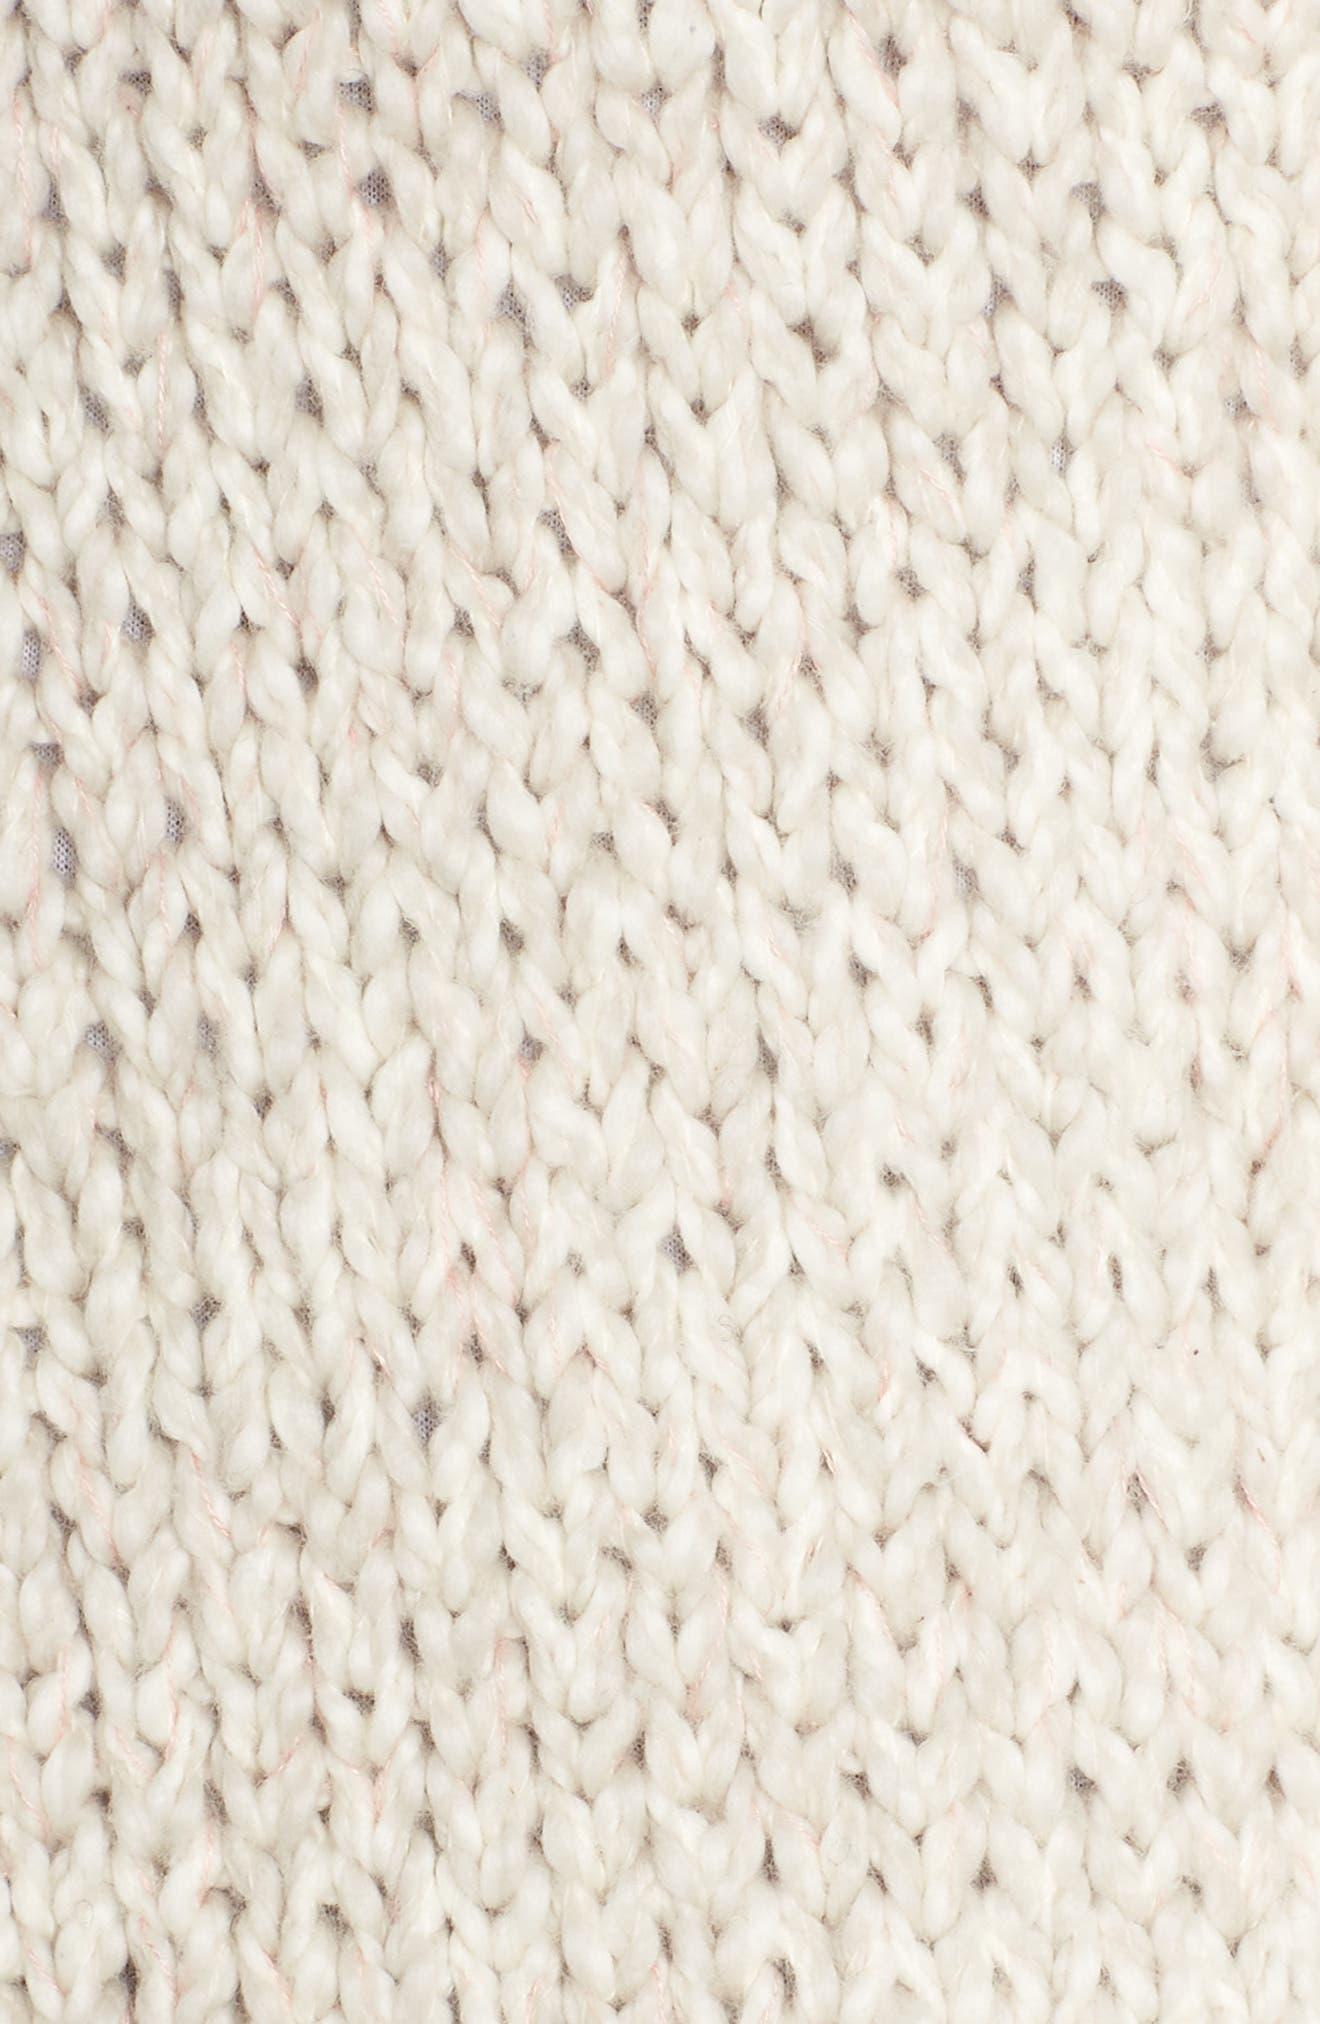 Kadia Organic Cotton Wrap,                             Alternate thumbnail 5, color,                             Gardenia Melange